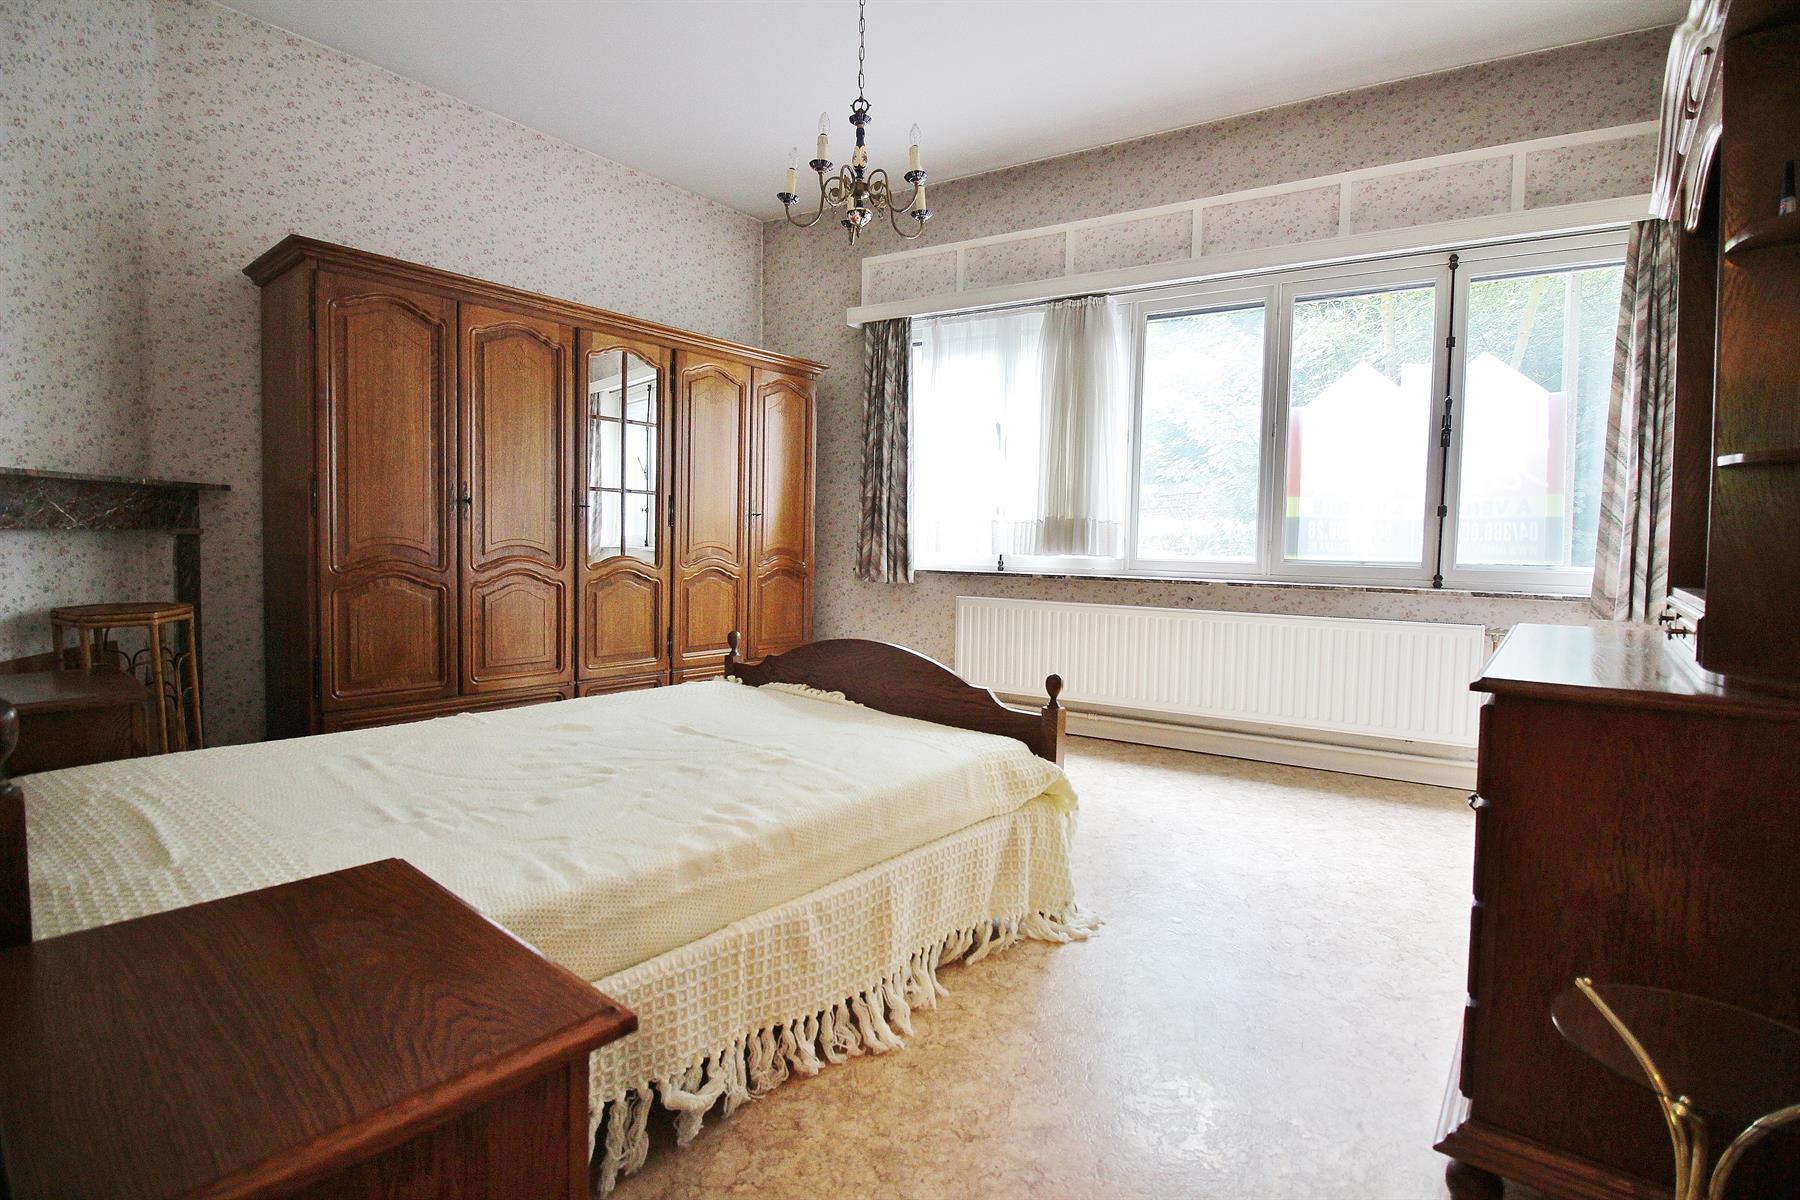 Bel-étage - Liege - #3470588-9